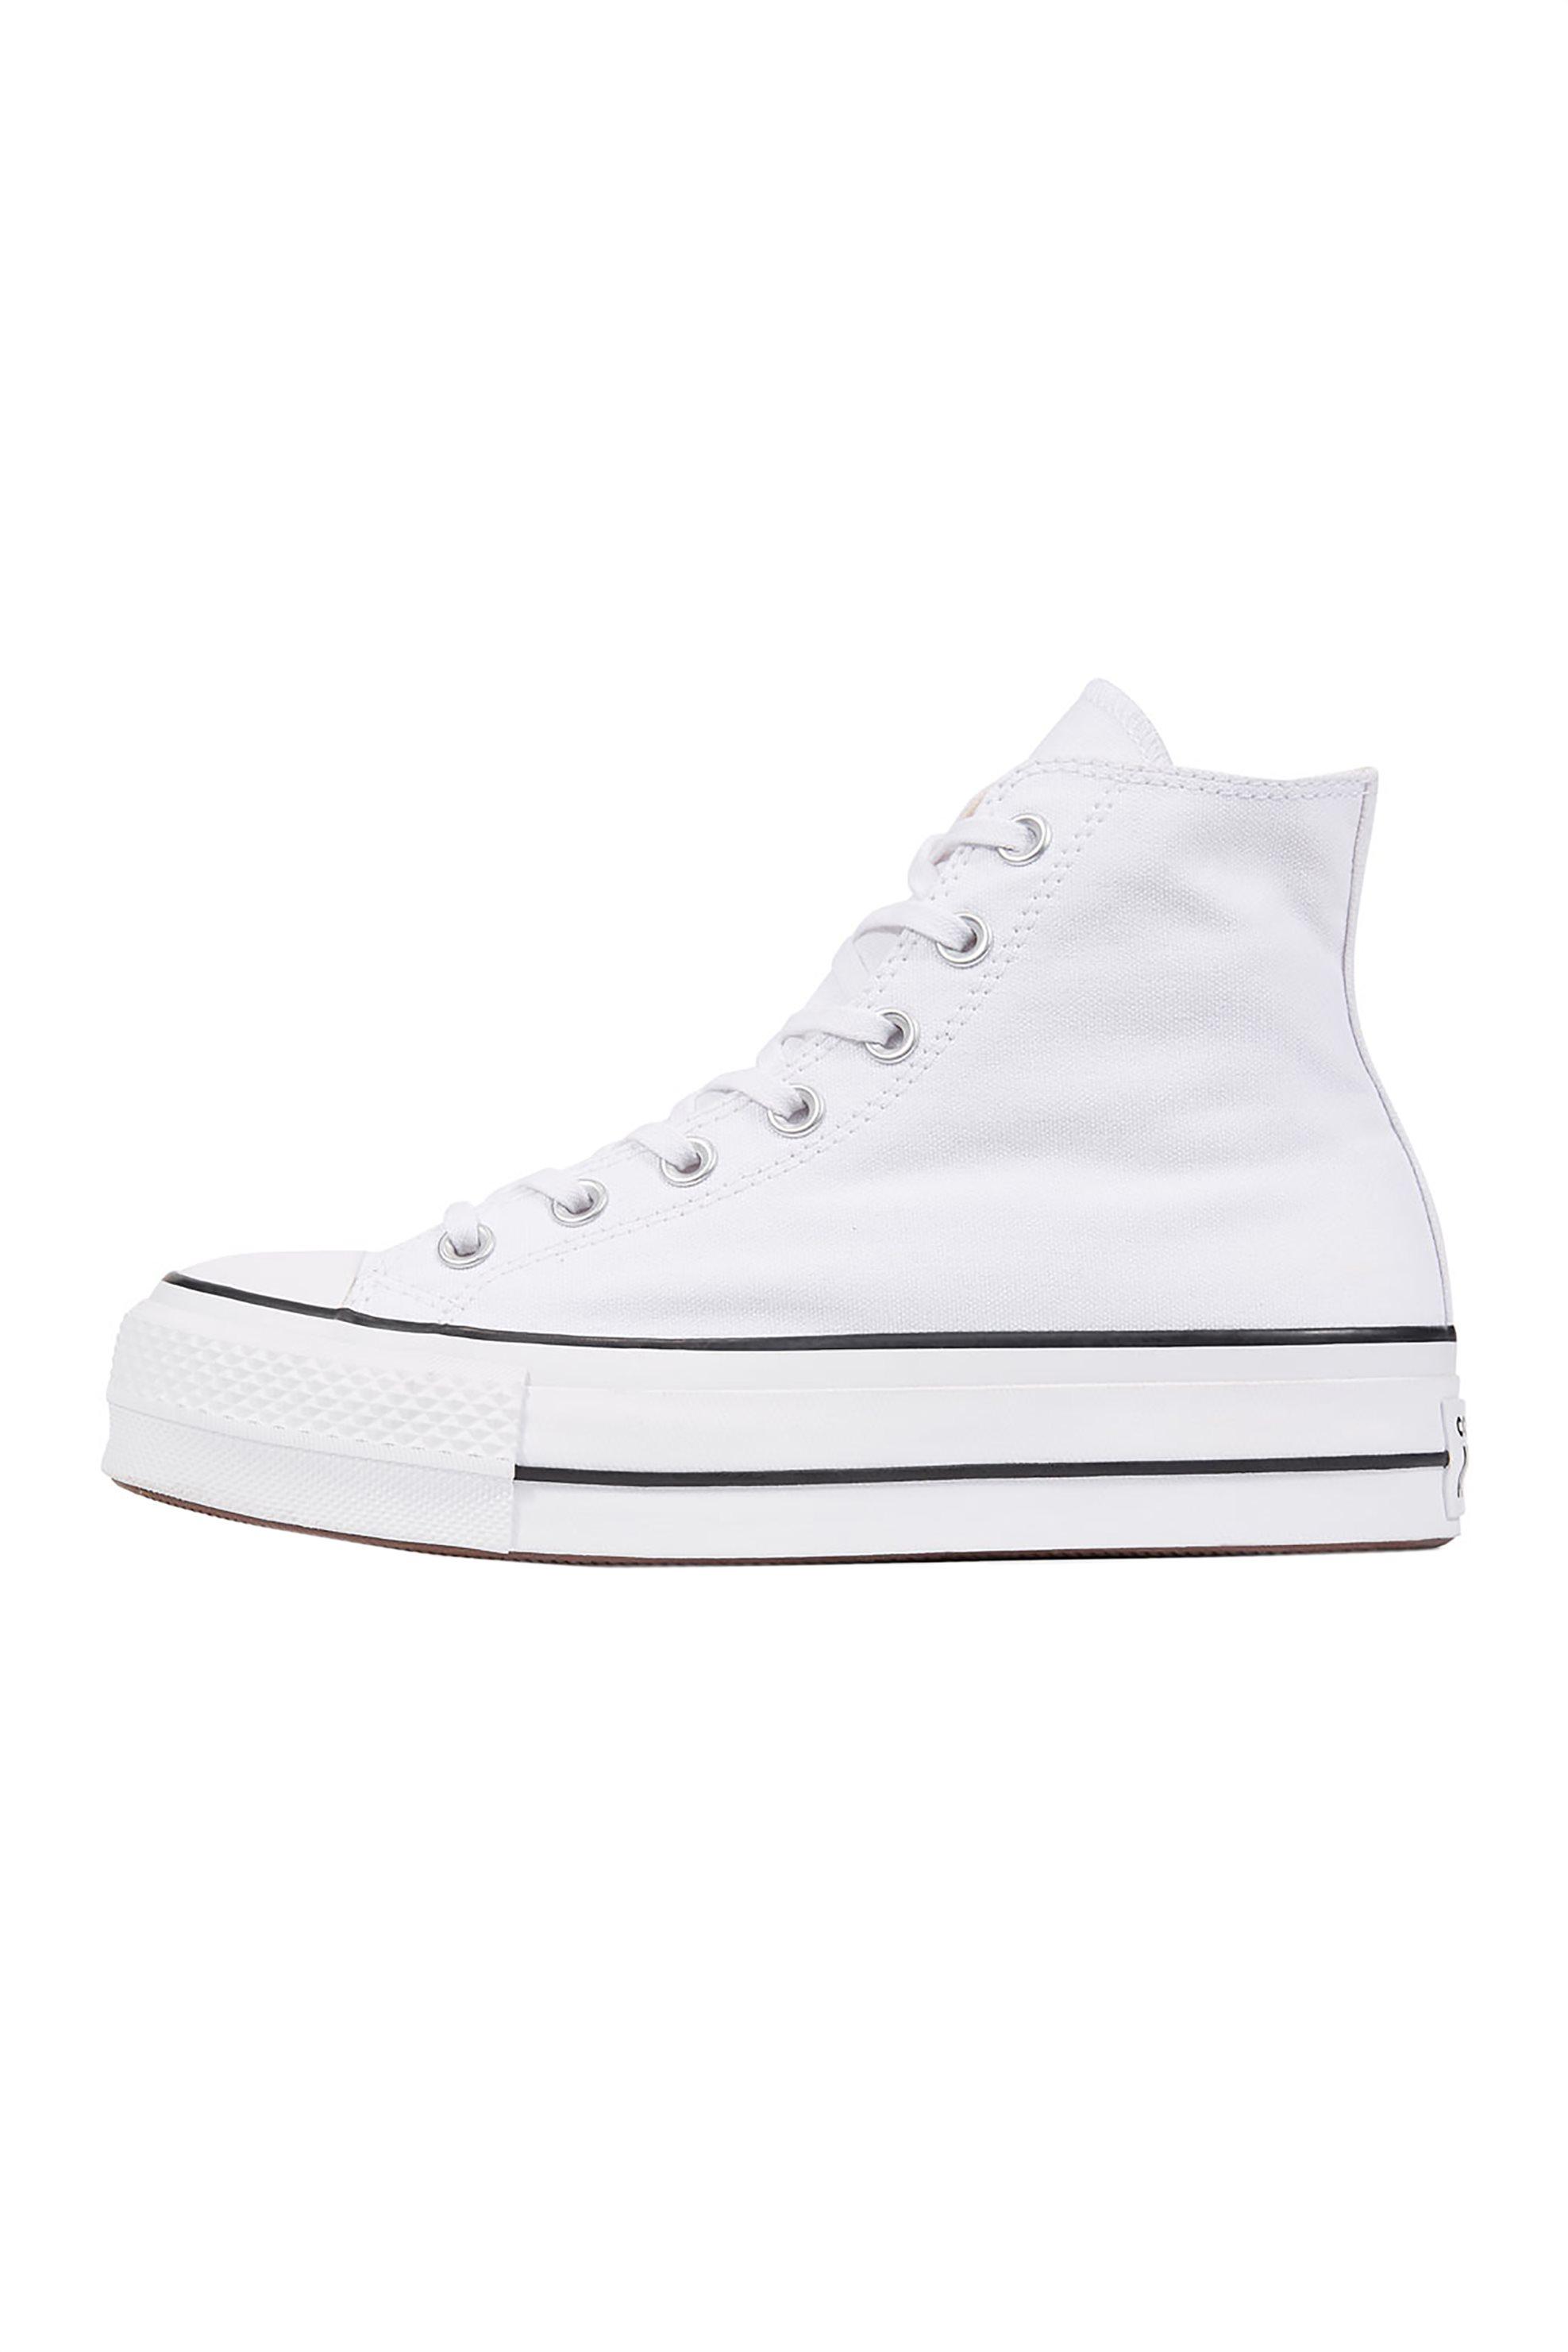 "Converse γυναικεία sneakers μποτάκια ""Chuck Taylor Platform All Star Lift High Top"" – 560846C – Λευκό"